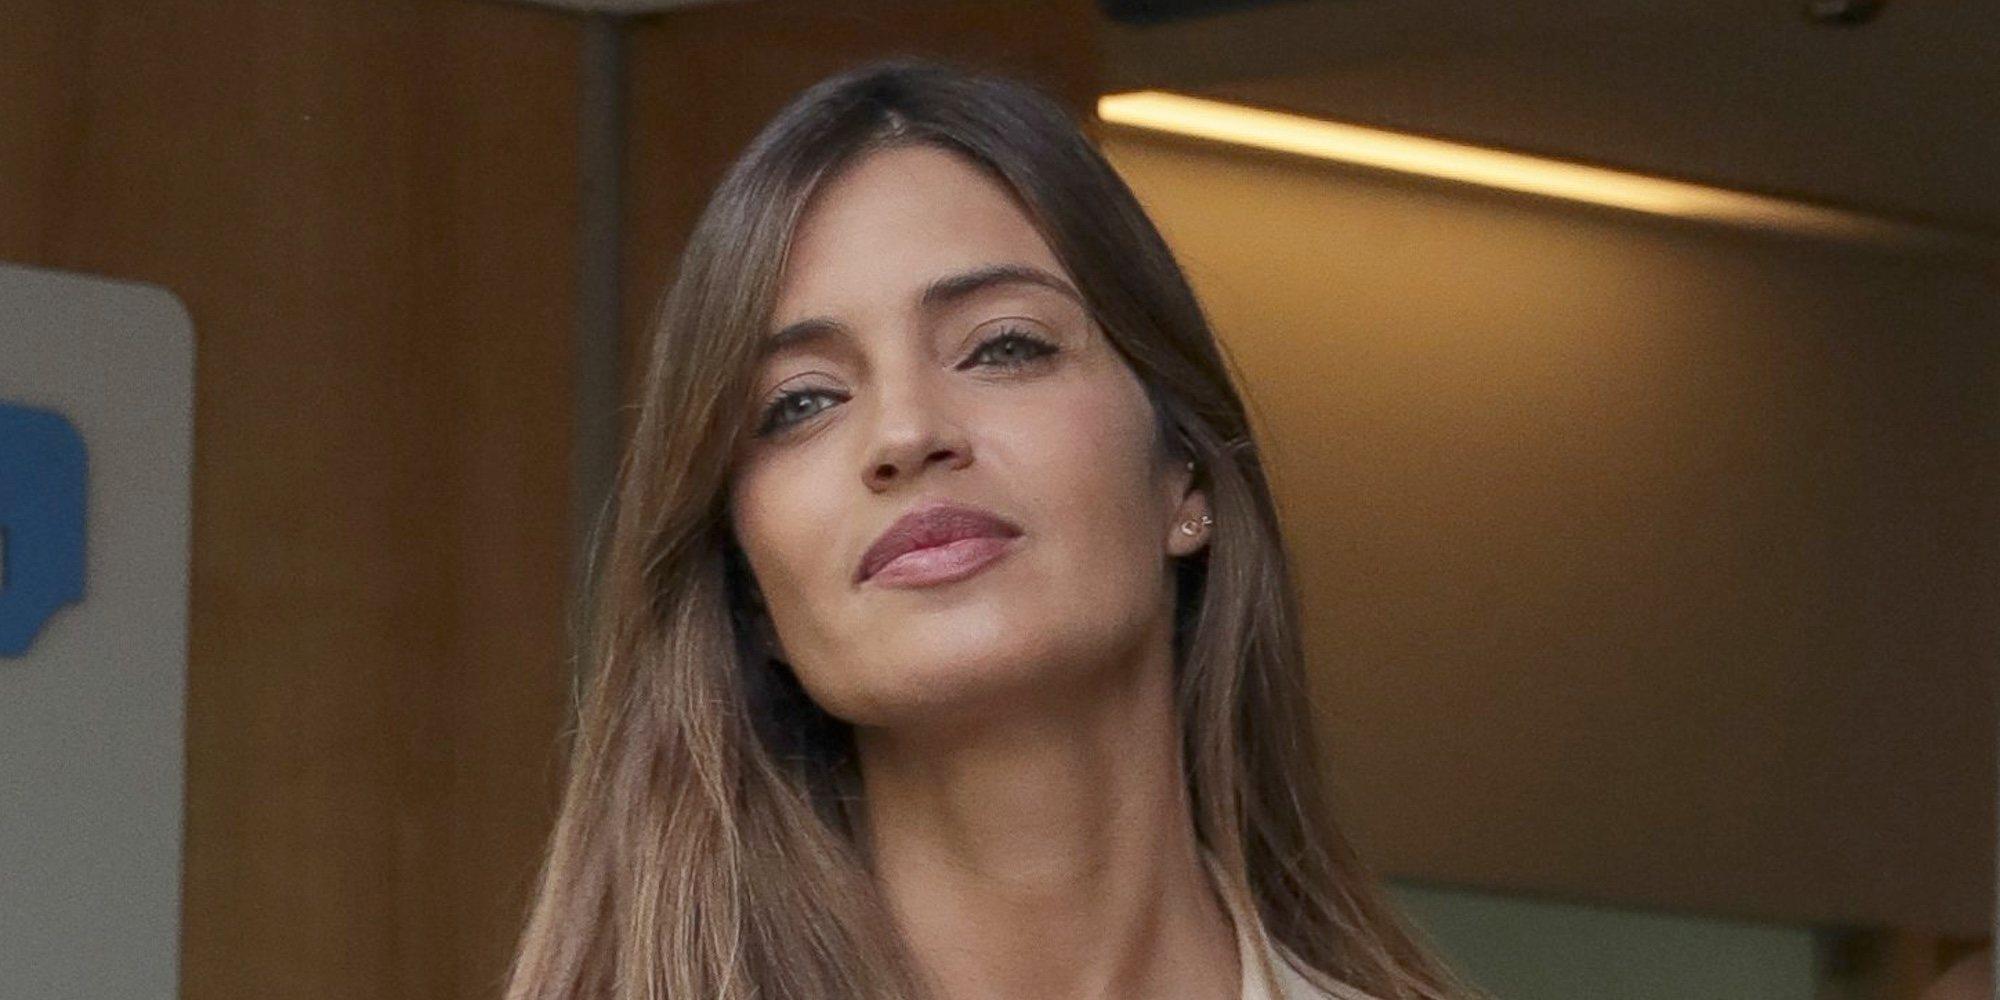 Se retrasa la salida del hospital de Sara Carbonero